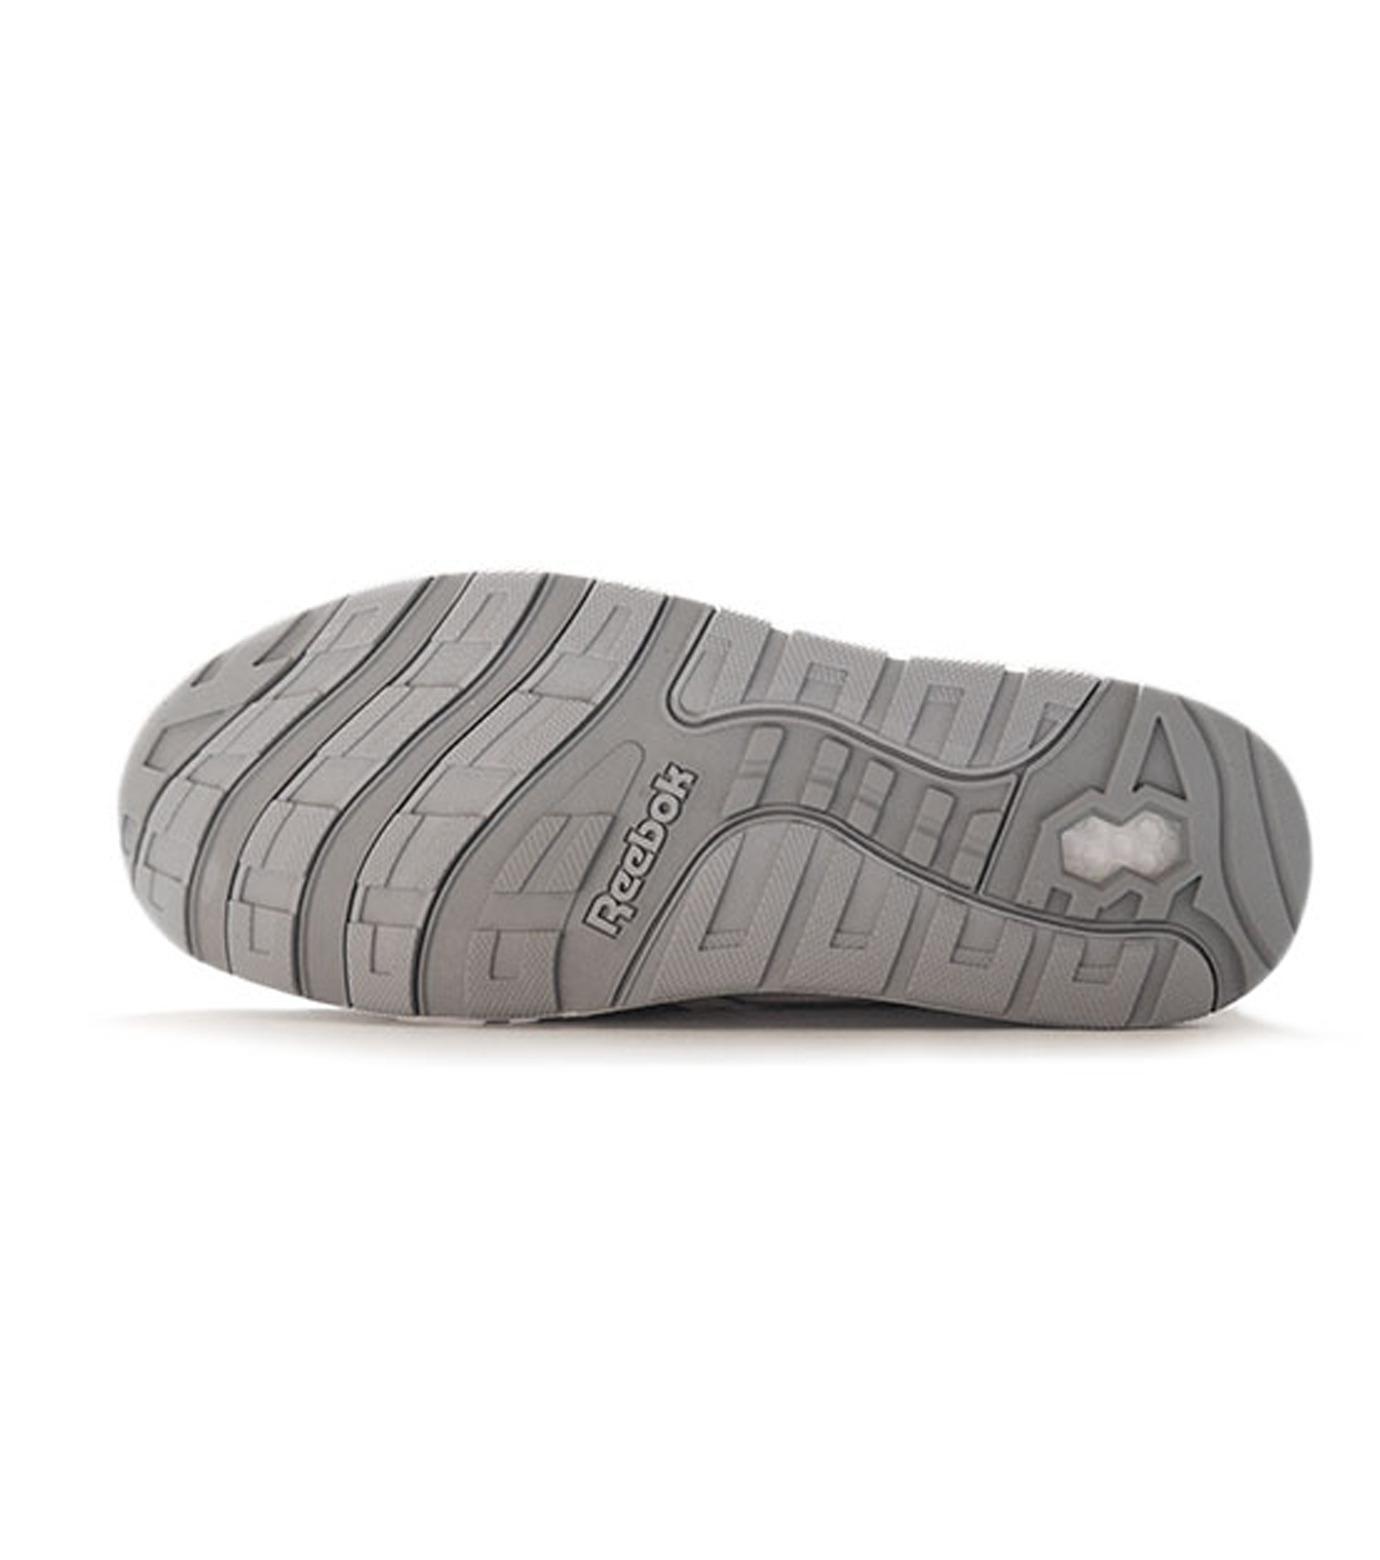 Reebok(リーボック)のVENTIIRATOR SUPREME-GRAY(シューズ/shoes)-V68694-11 拡大詳細画像2